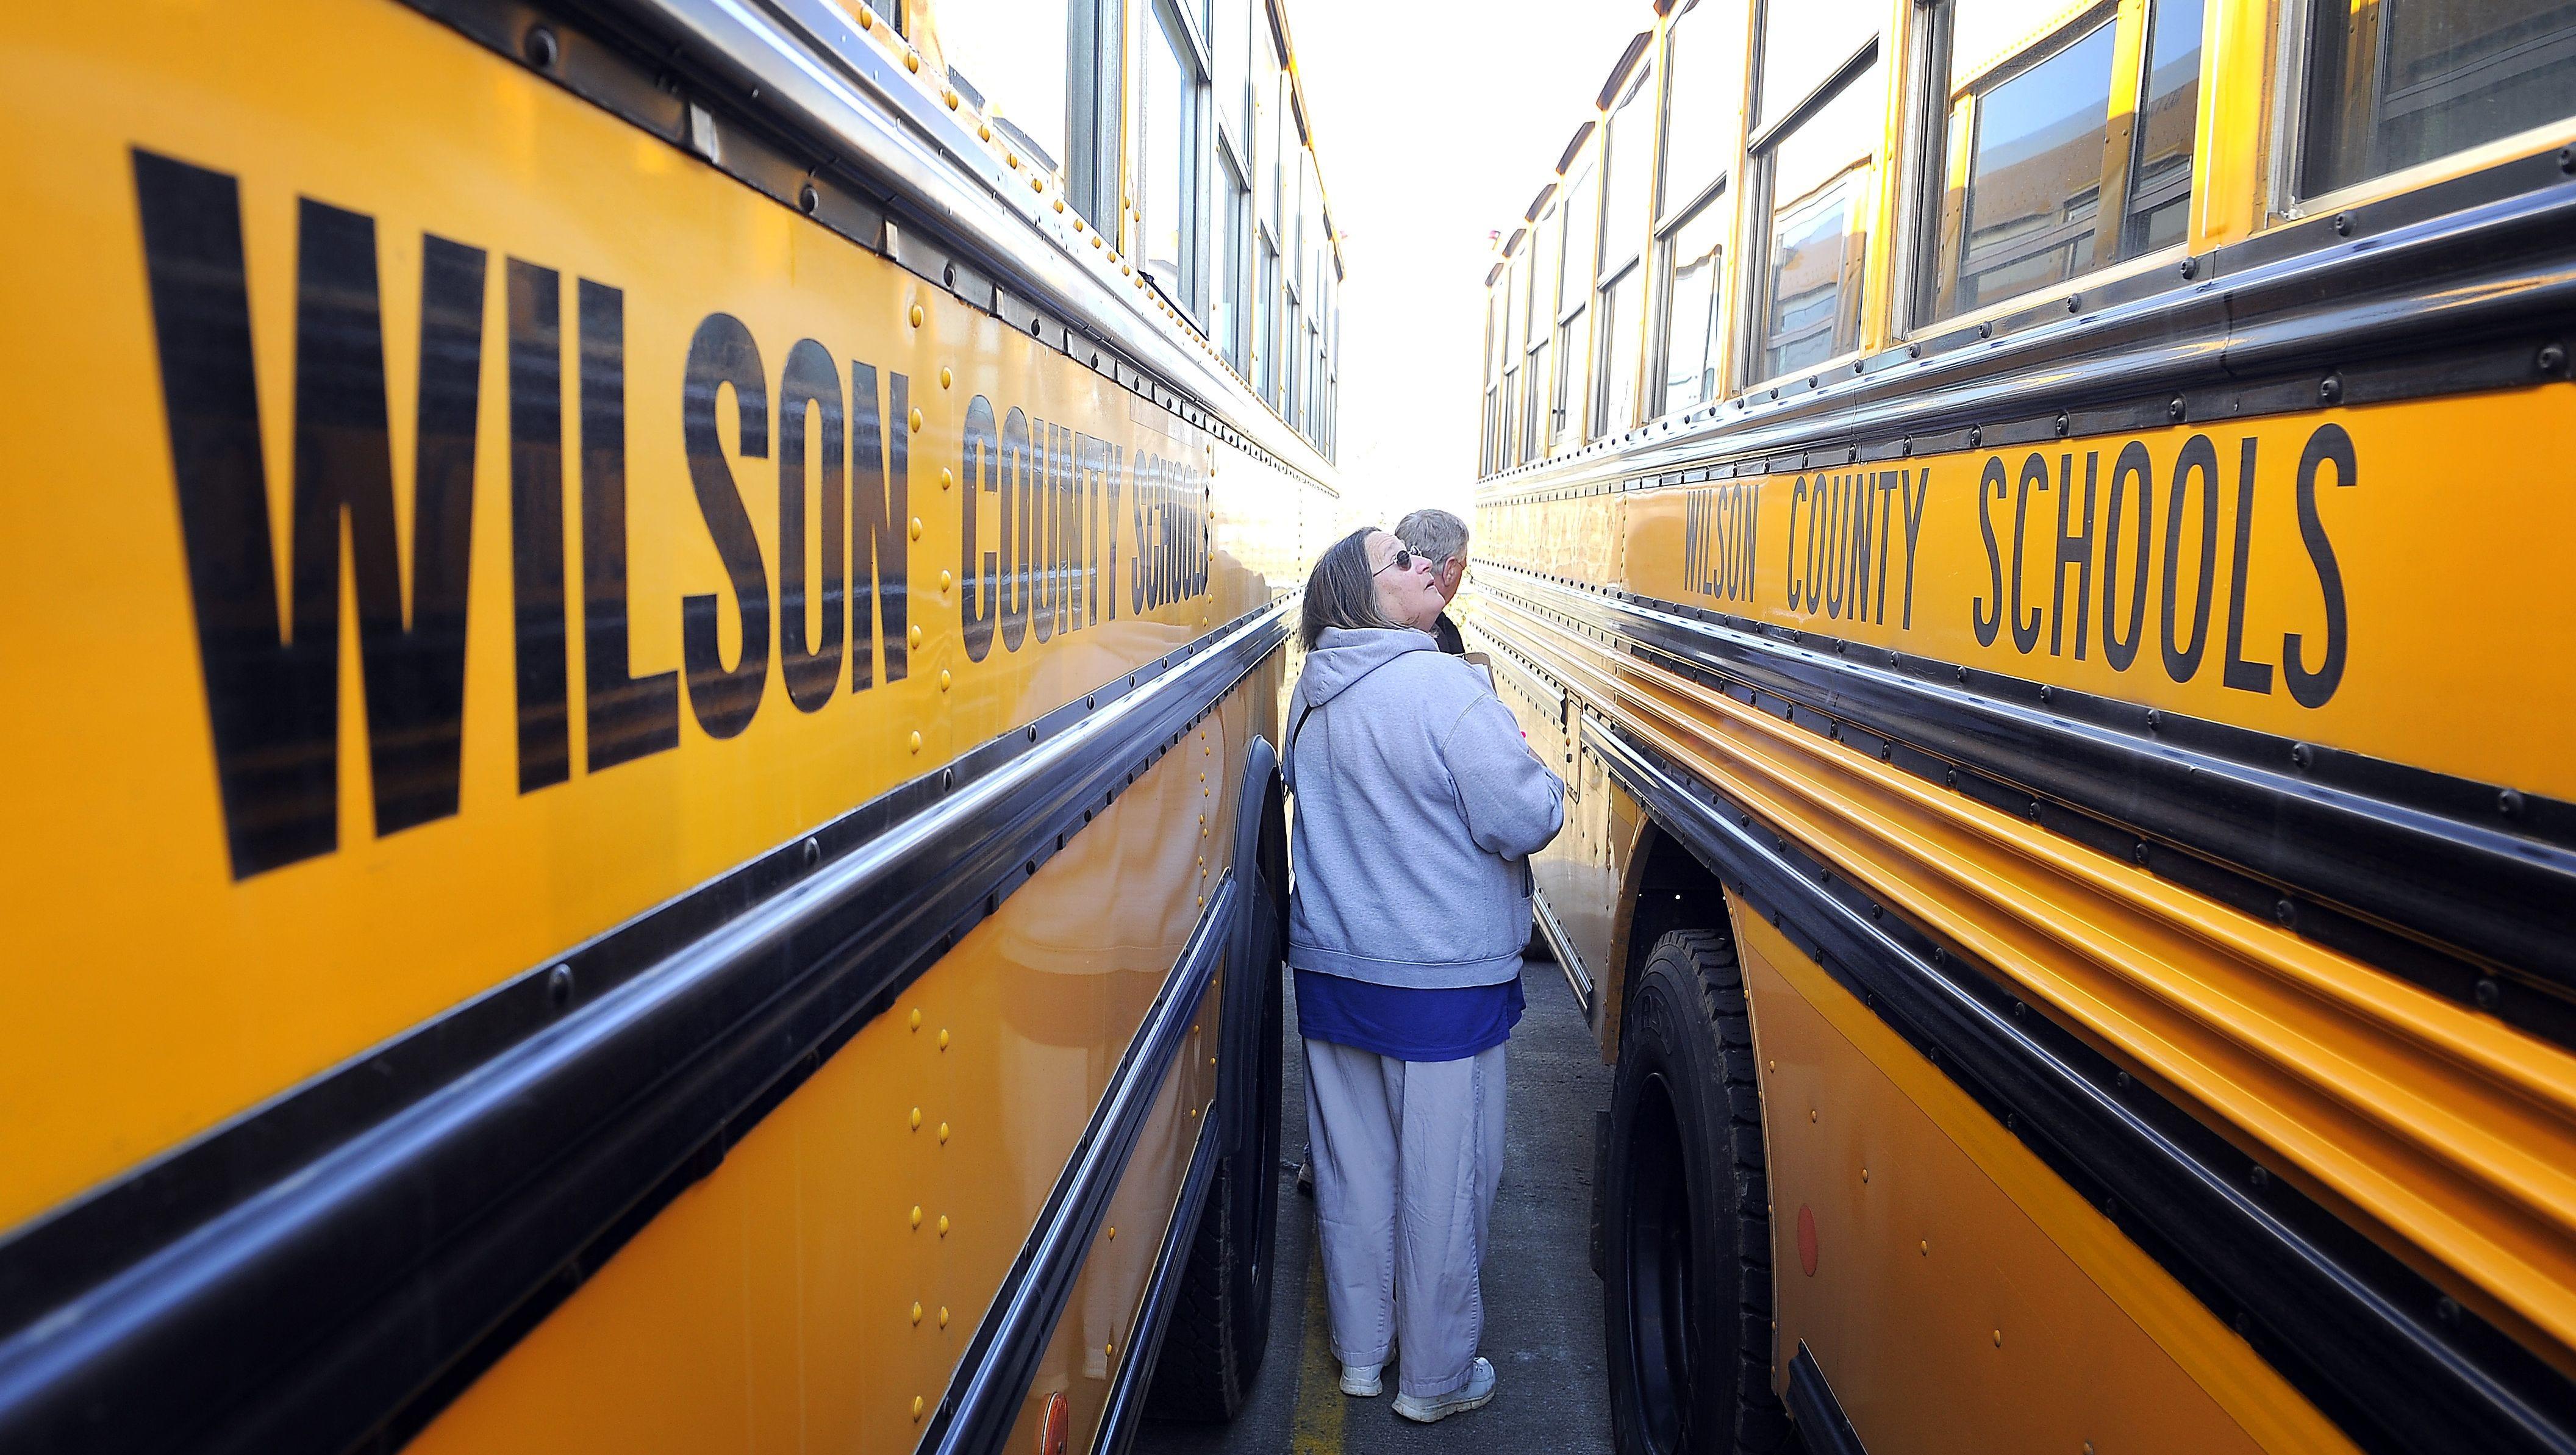 Wilson County Schools To Conduct Fall Break Survey For For When Is Fall Break For Wilson County Schools